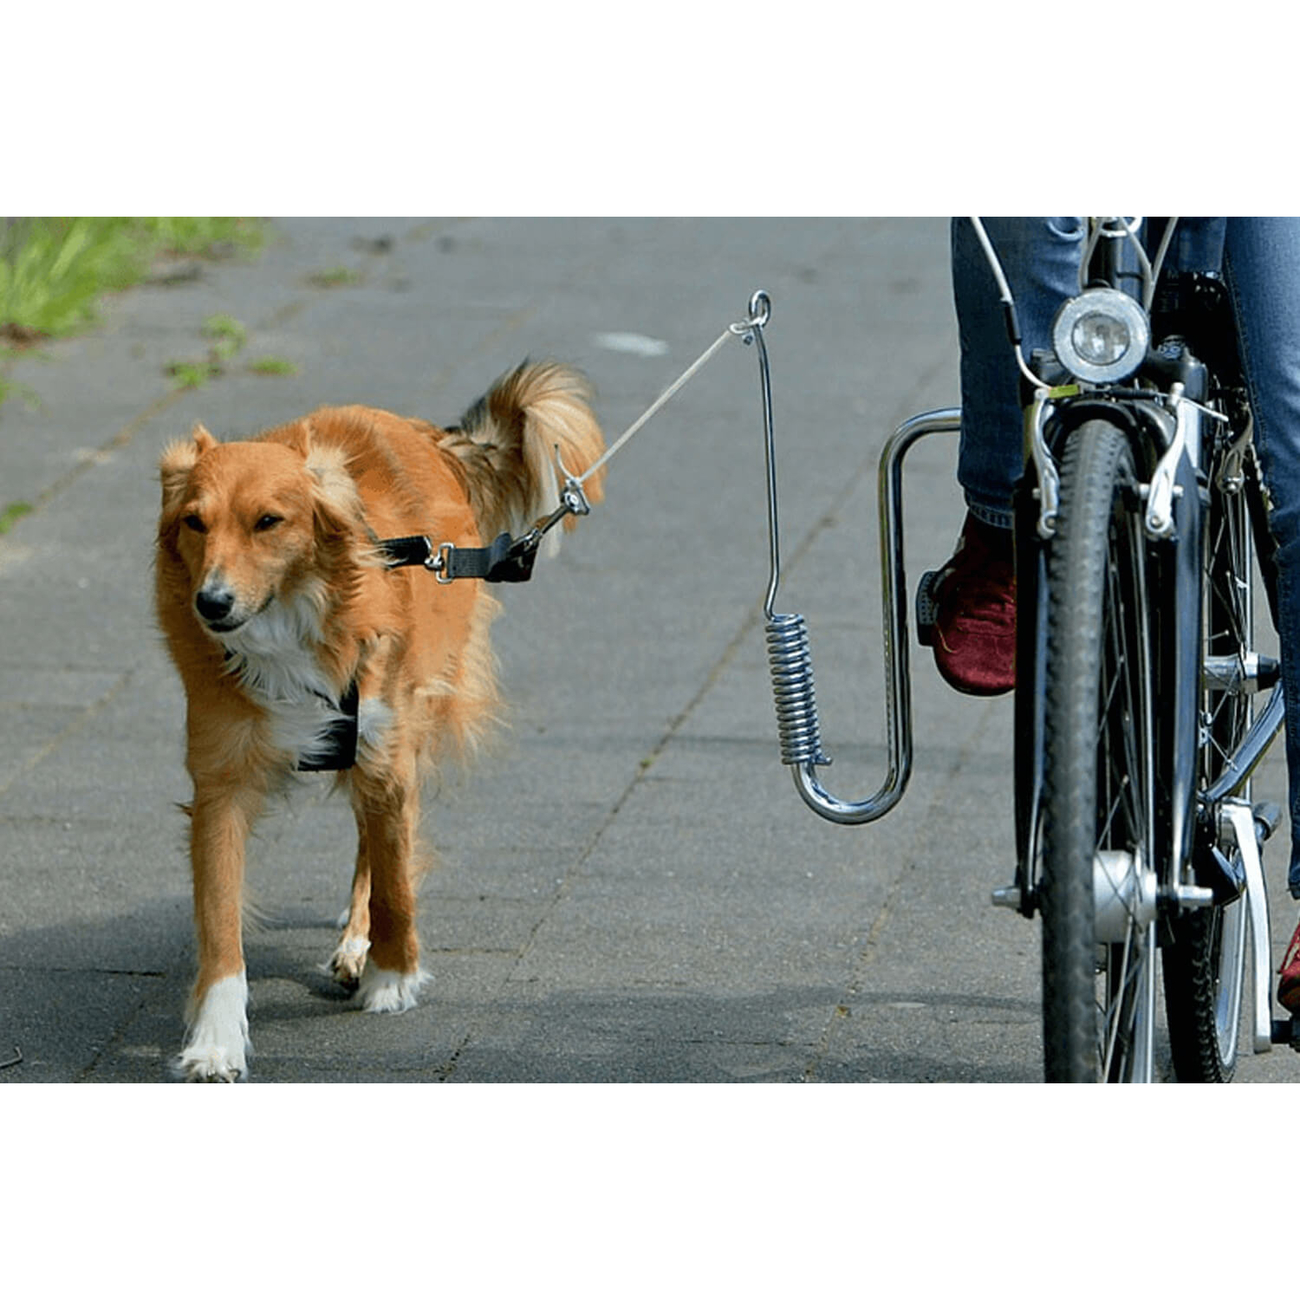 Karlie Flamingo Doggy Guide Fahrradhalter Hund, Bild 2